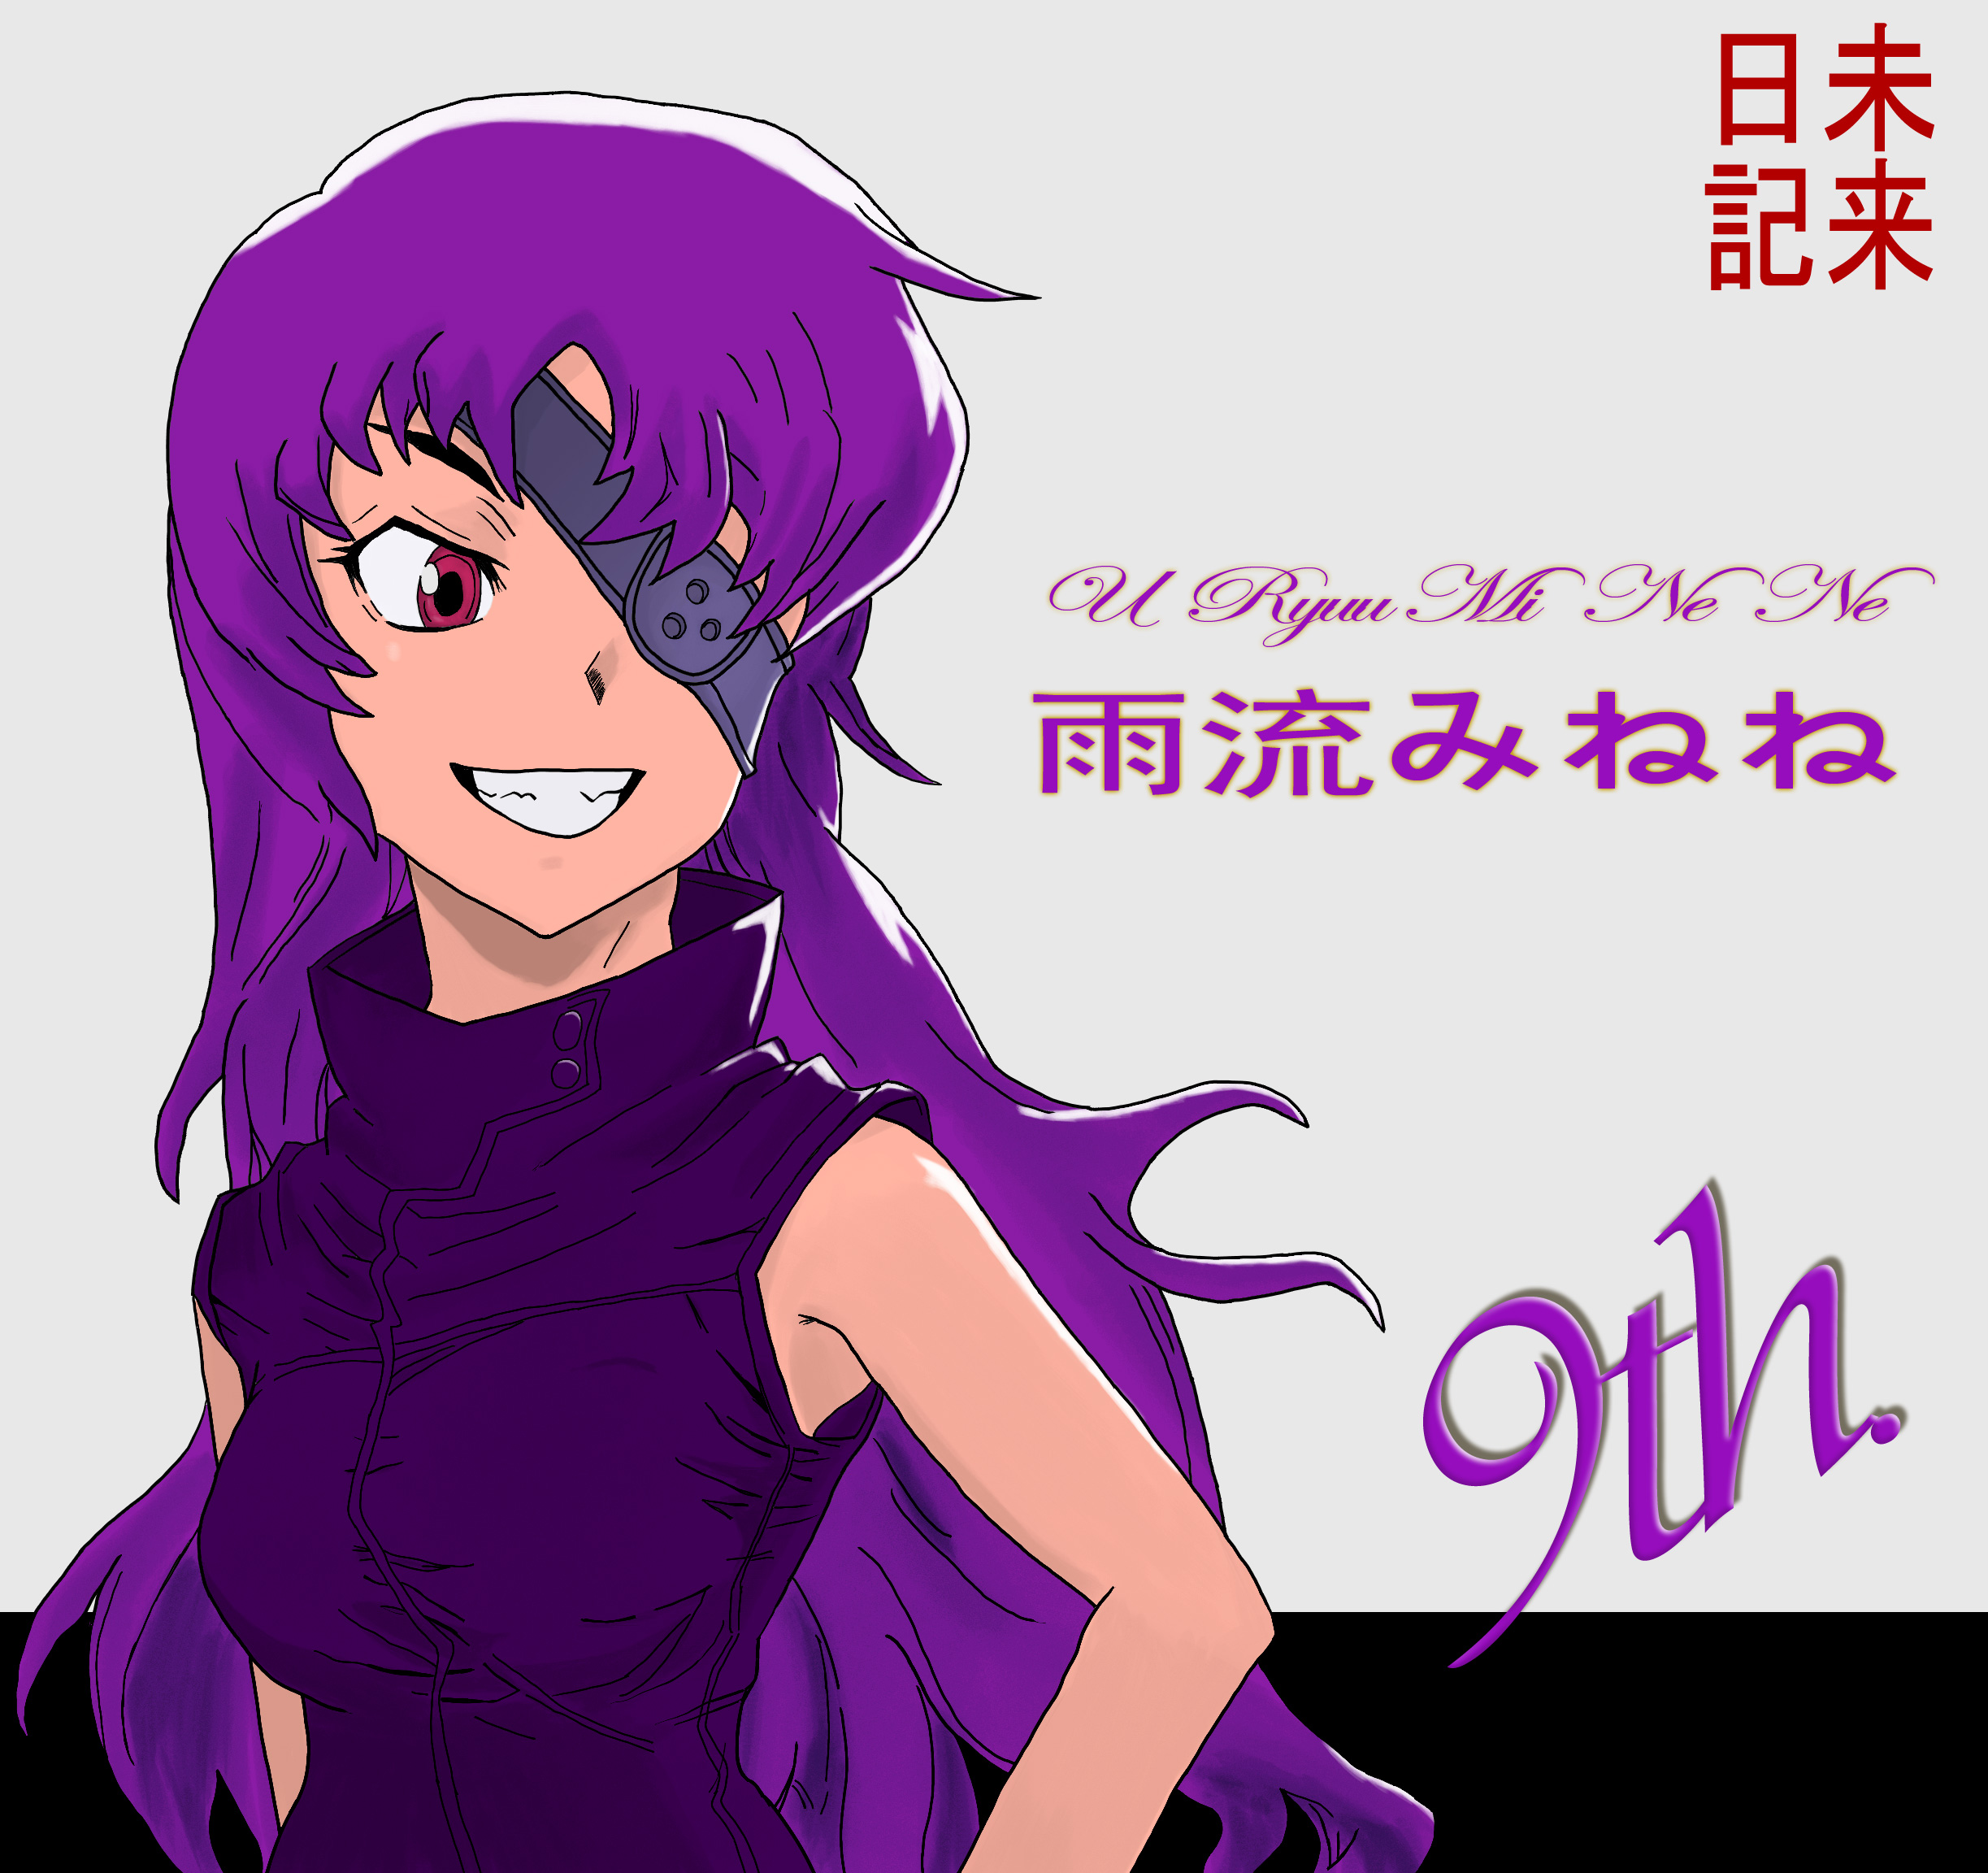 Marry an anime manga videogame guy or girl Page 91 Fun Cafe